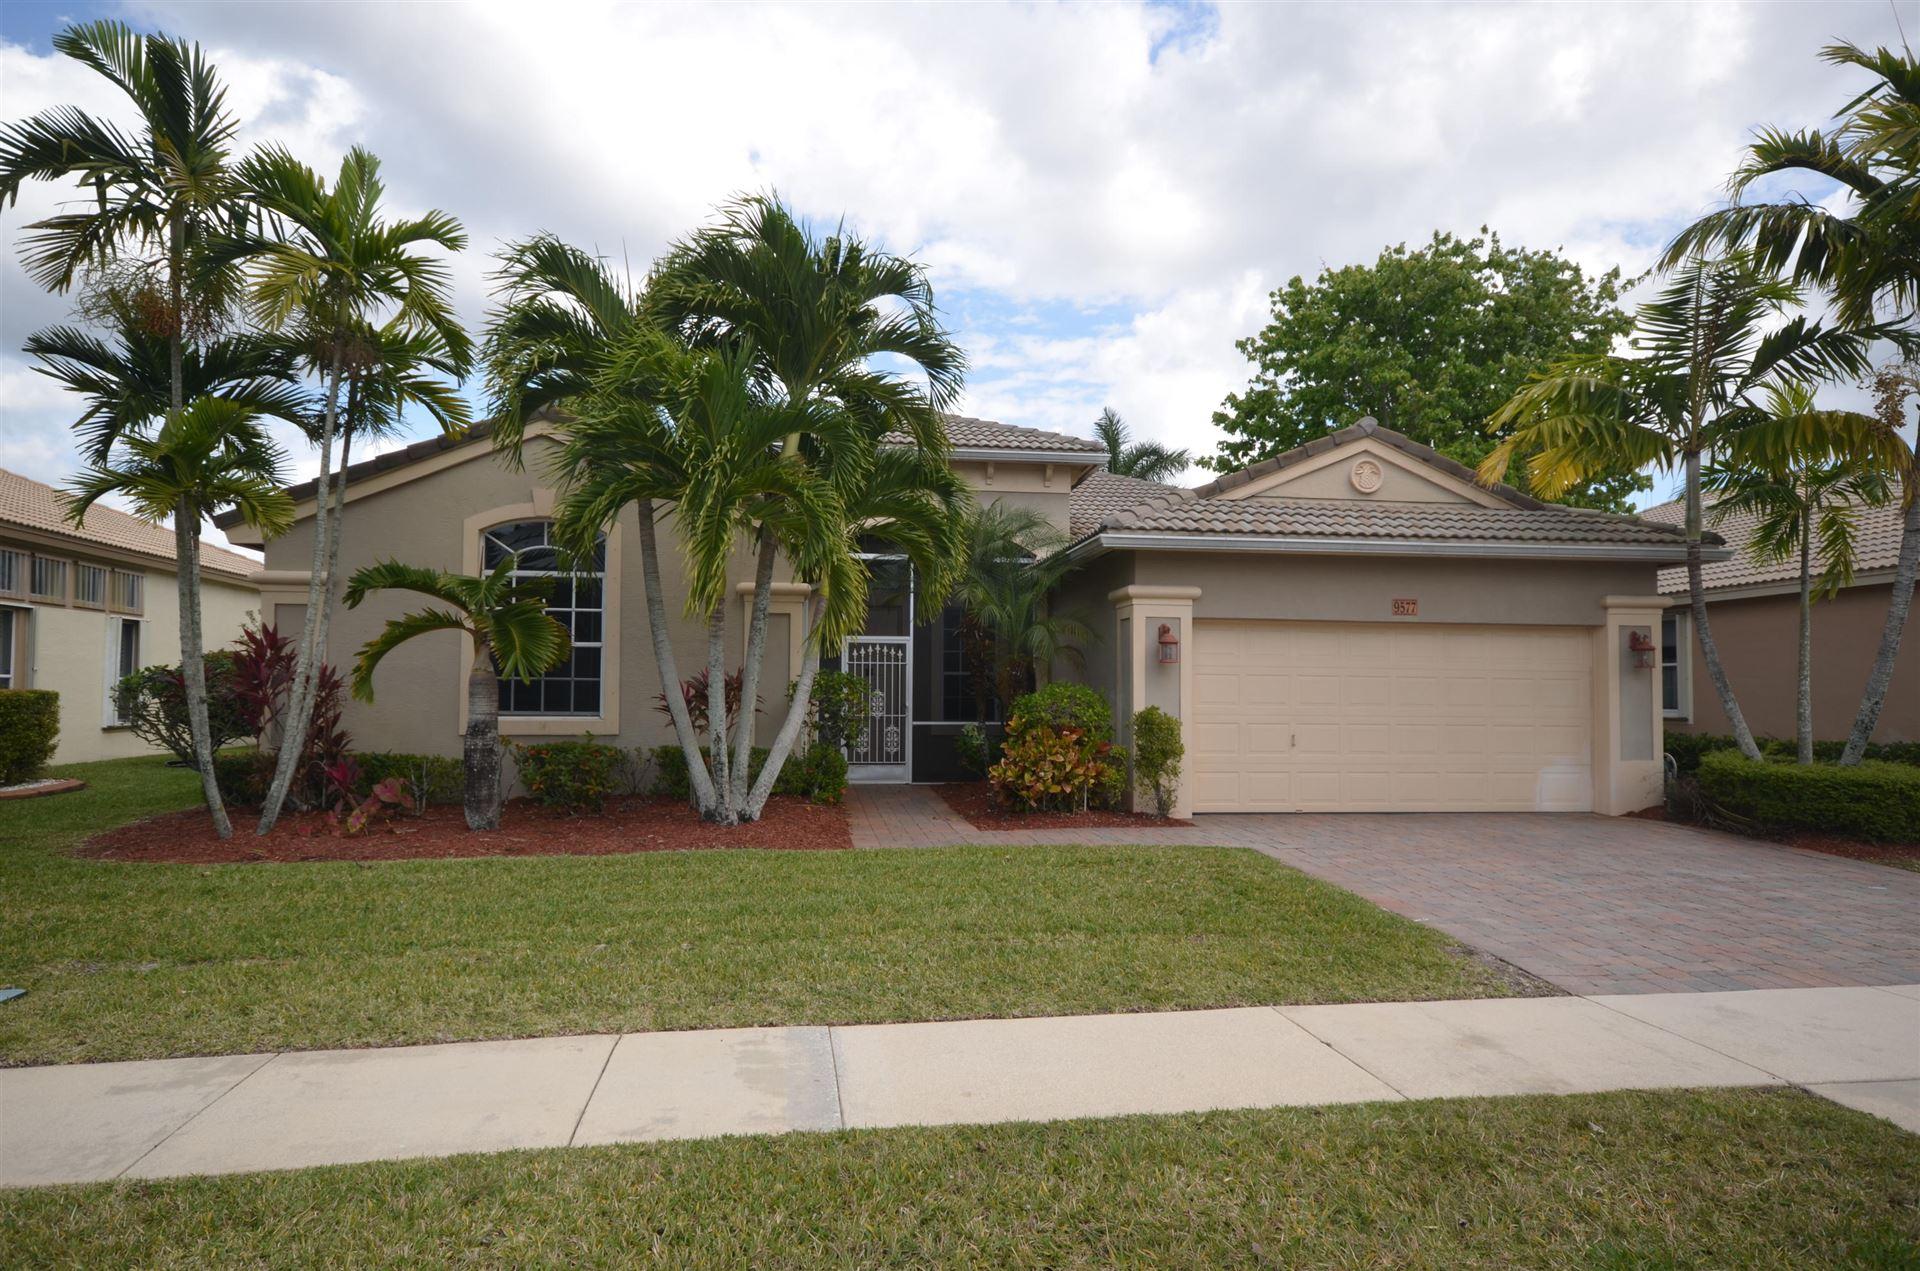 9577 Lantern Bay Circle, West Palm Beach, FL 33411 - #: RX-10659975